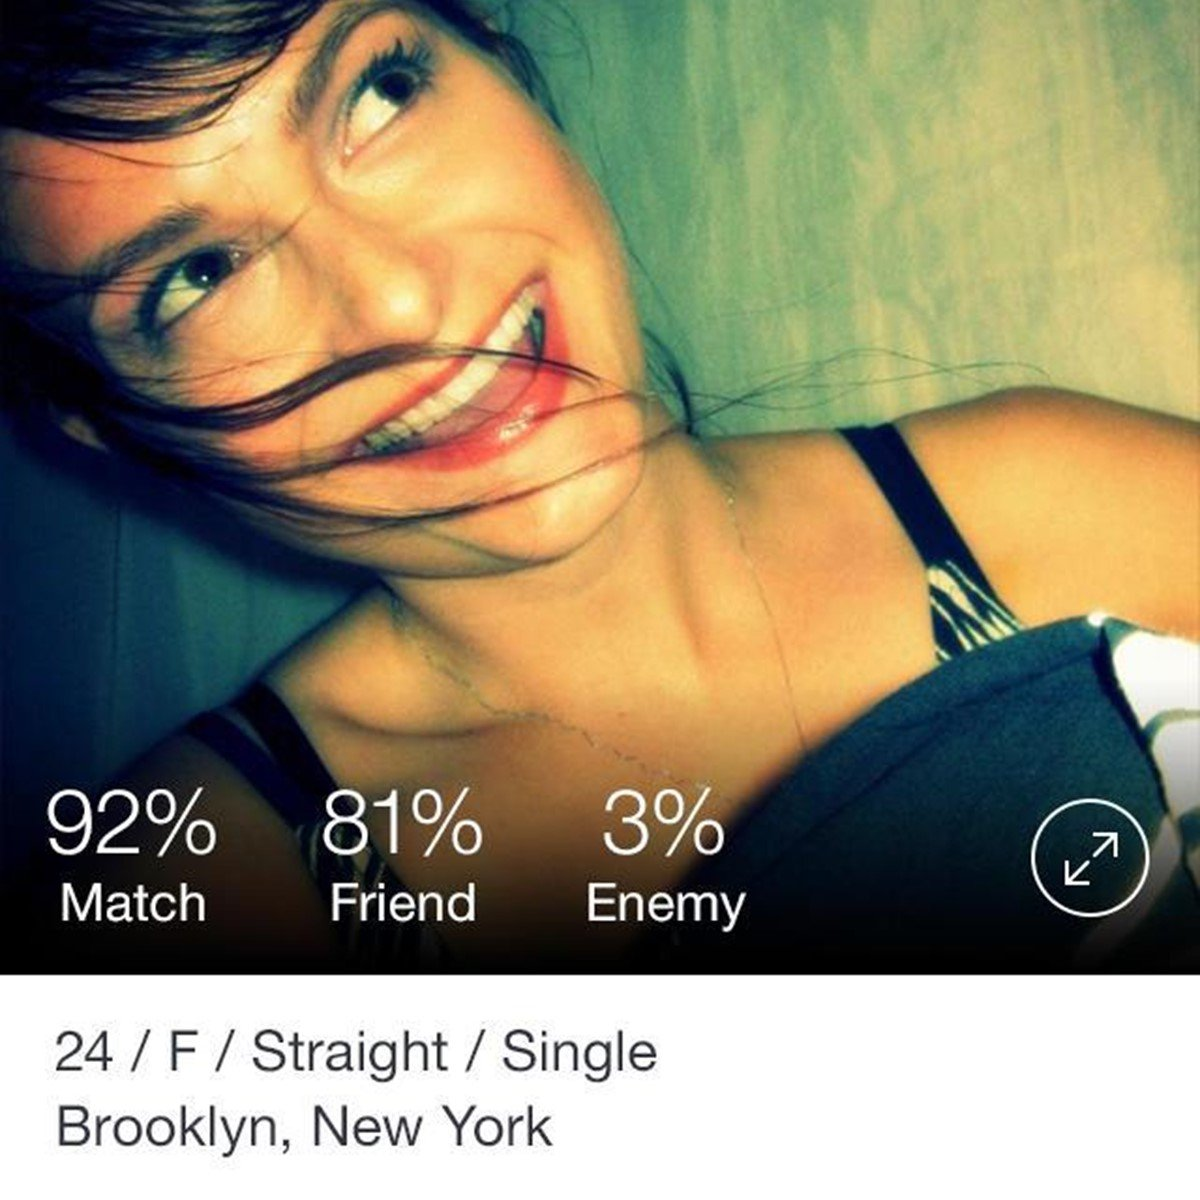 OkCupid Alternatives and Similar Apps and Websites